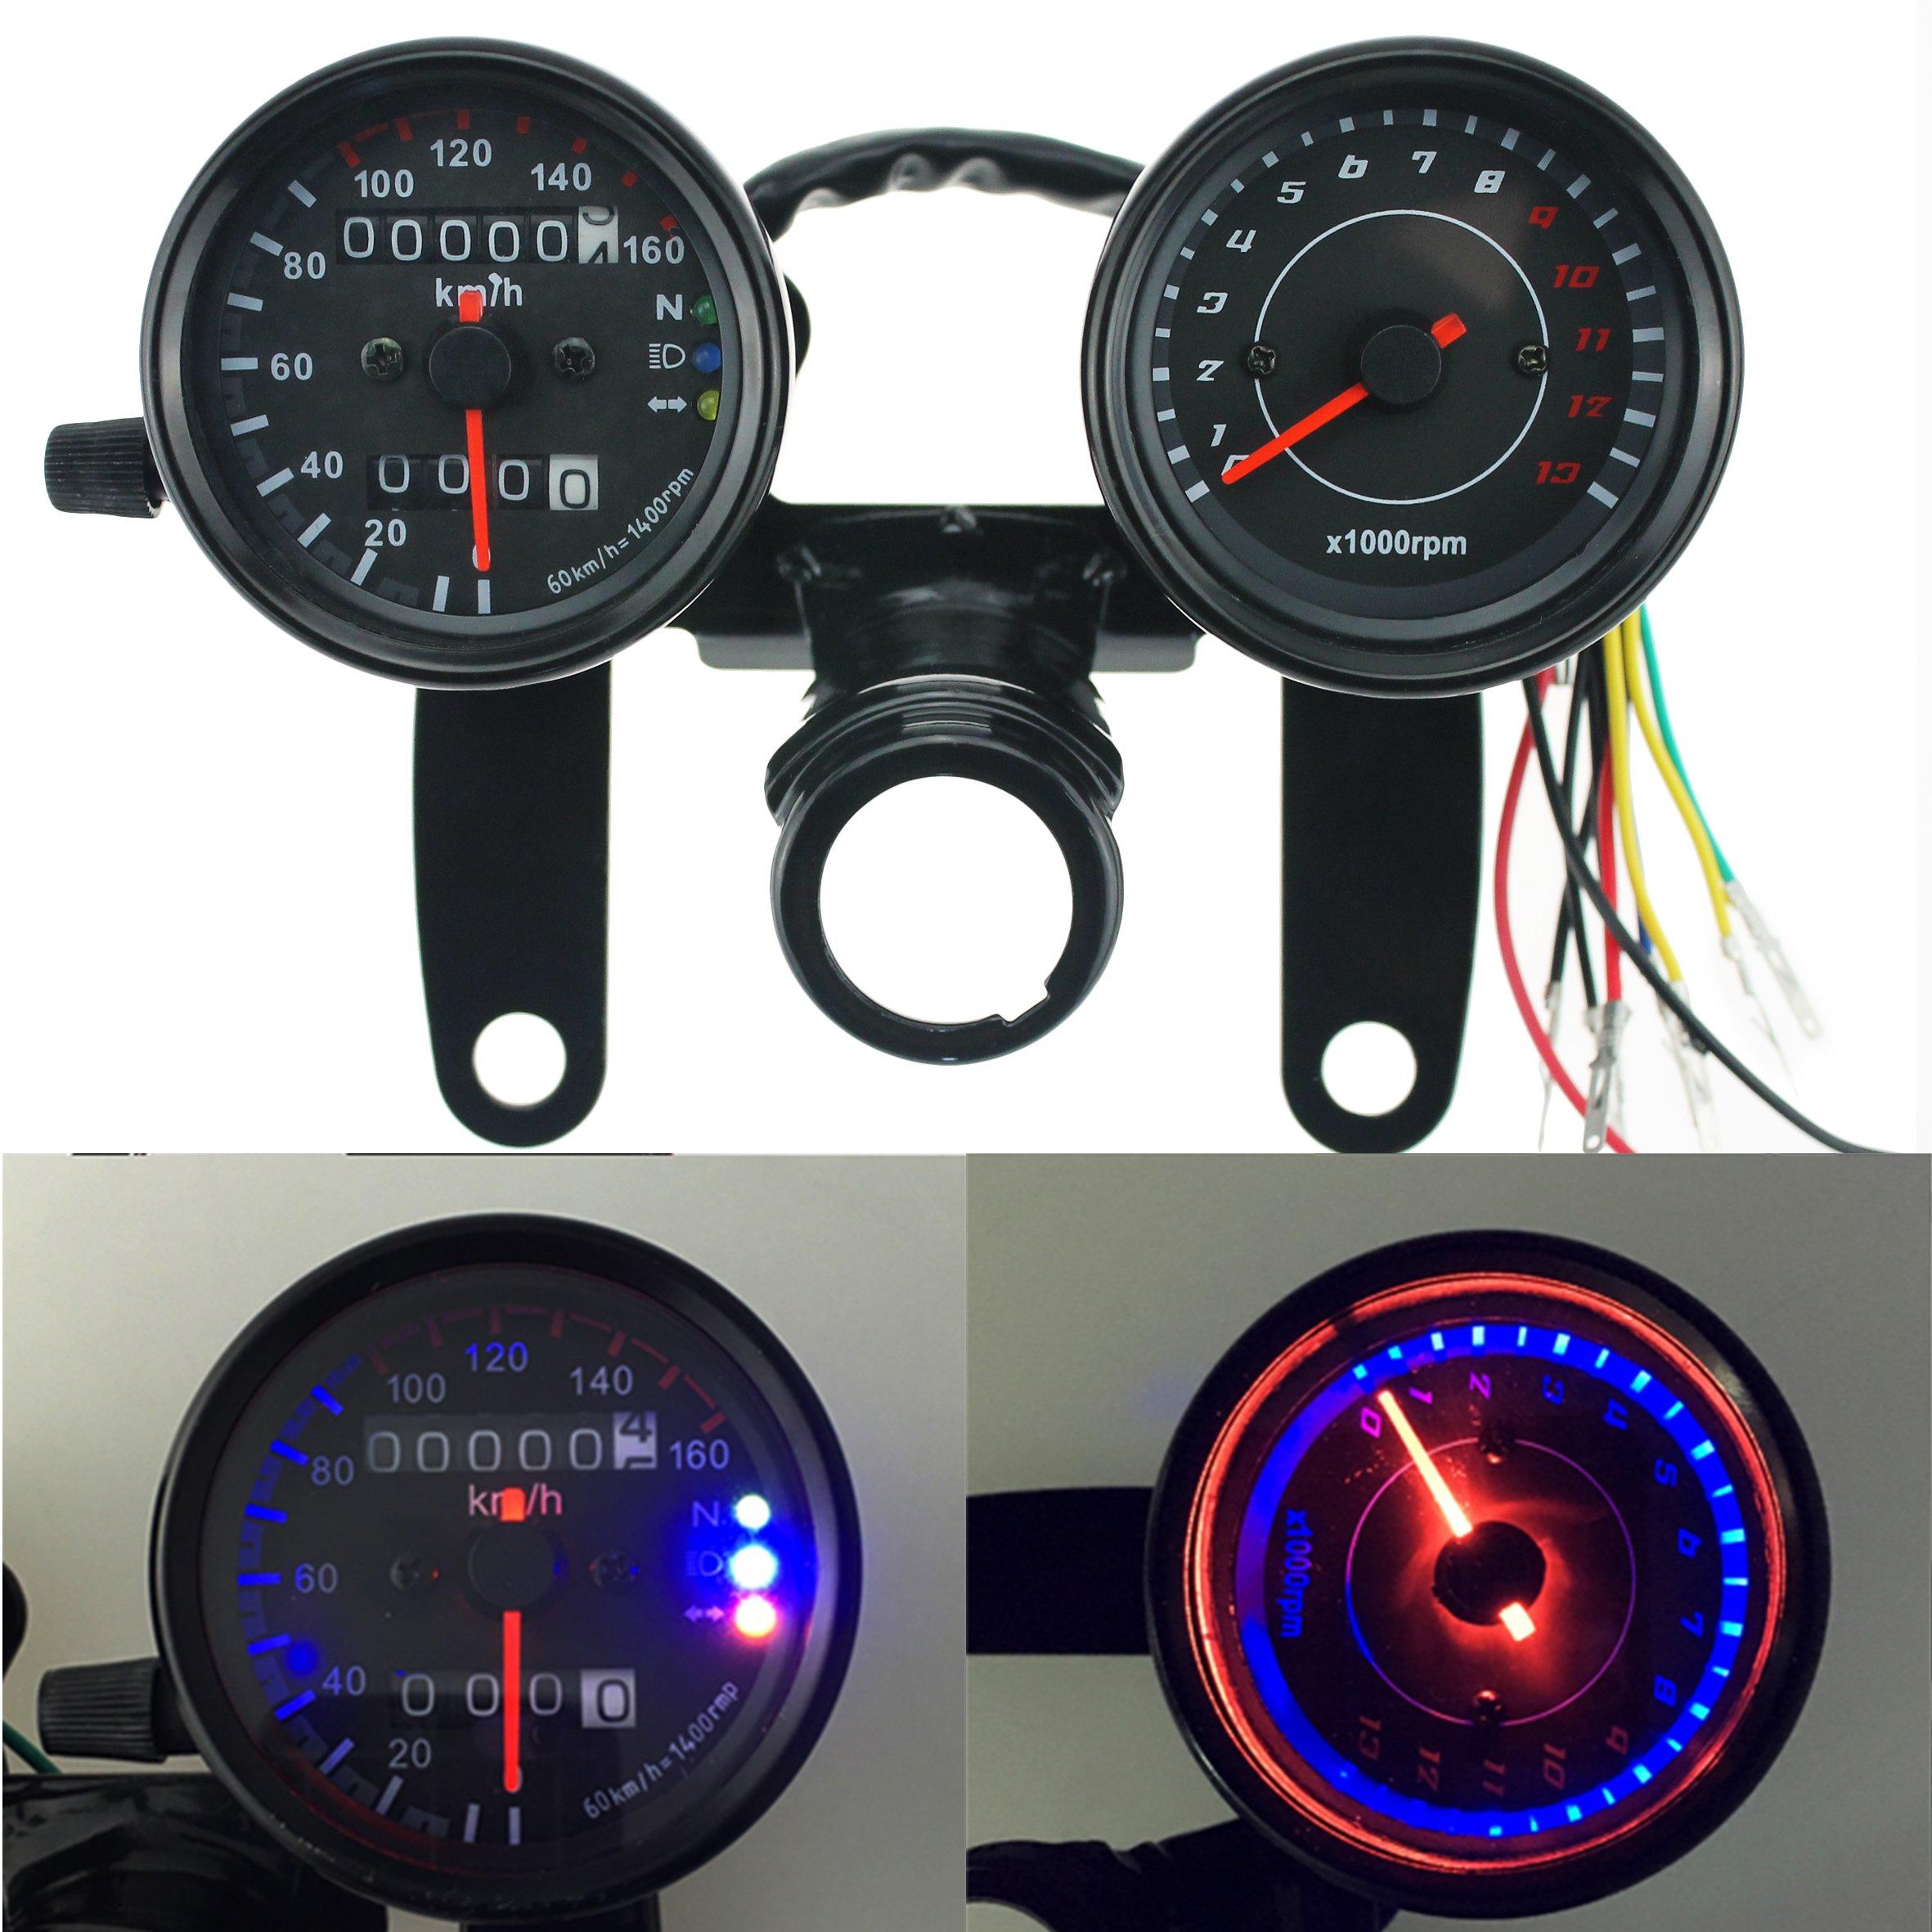 Iztor Motorcycle black Odometer Speedometer and Tachometer with Bracket for Yamaha SR XV RX Cafe Racer Suzuki Honda Kawasaki by iztor